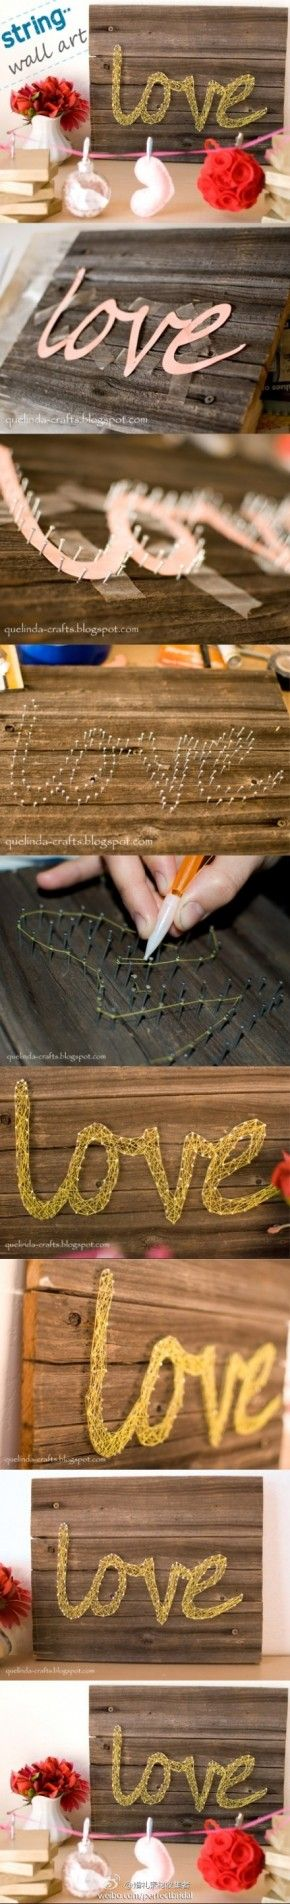 letters maken op (stijger)hout.